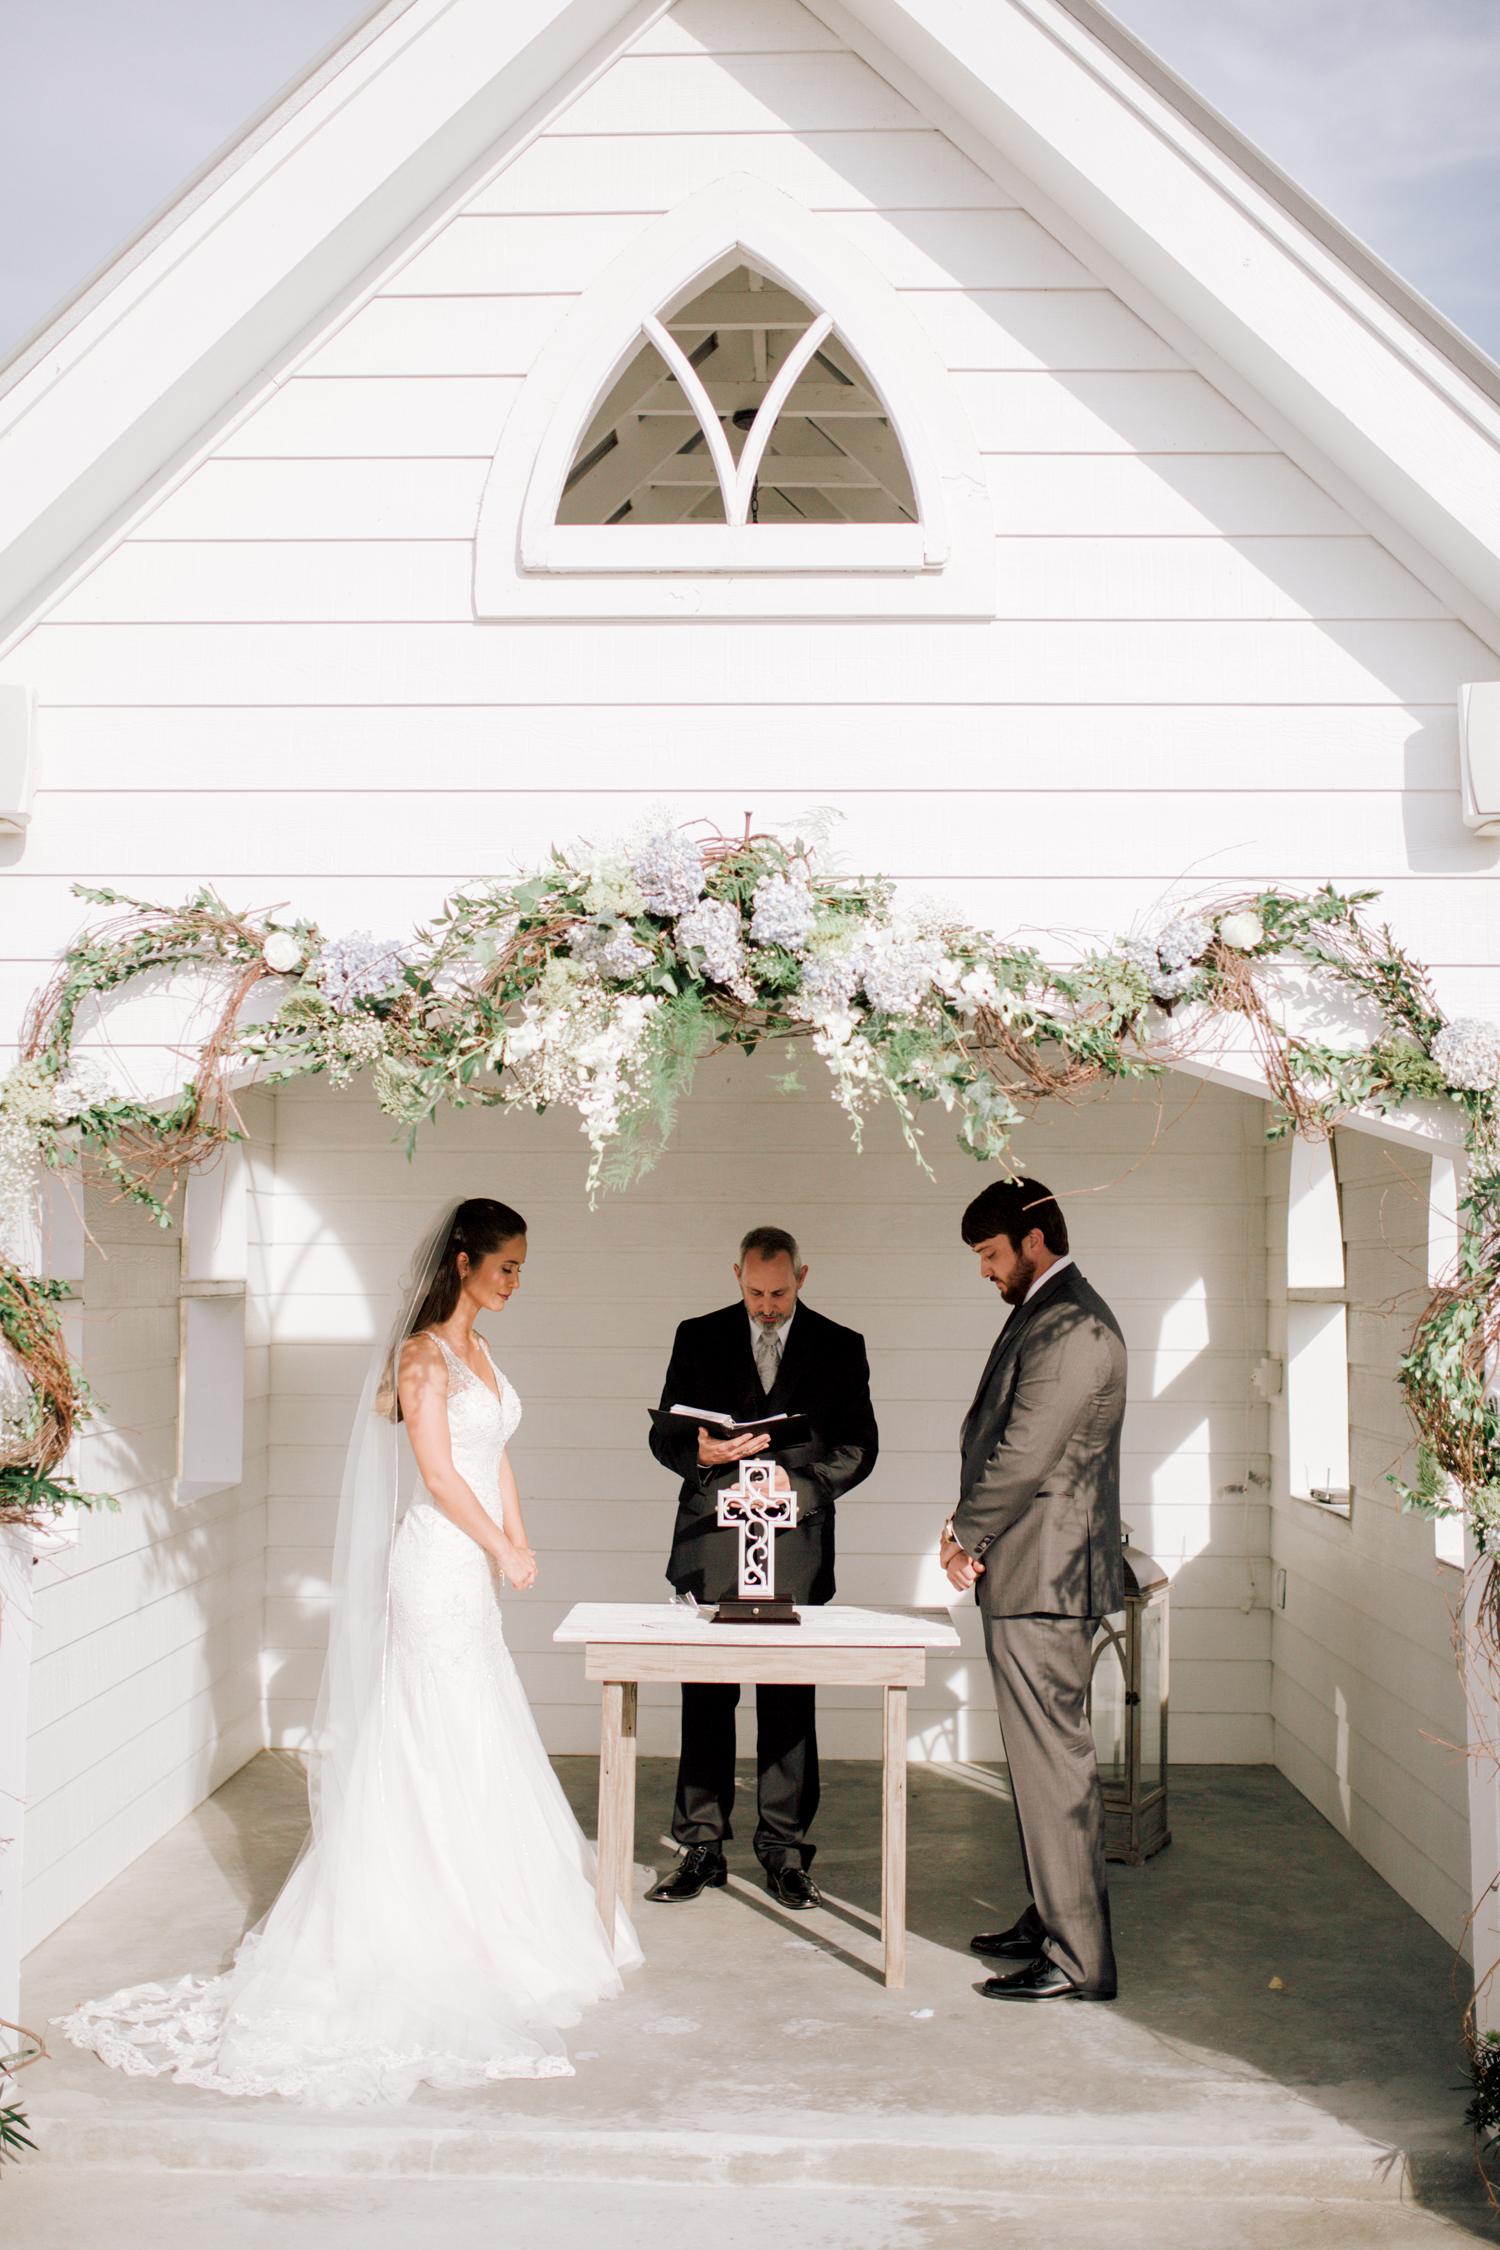 alaa-marzouk-photography-rgvweddingphotographer-rio-grande-valley-mathis-wedding-bridal-bride-san-antonio-portrait-weddings-mcallen-104.jpg